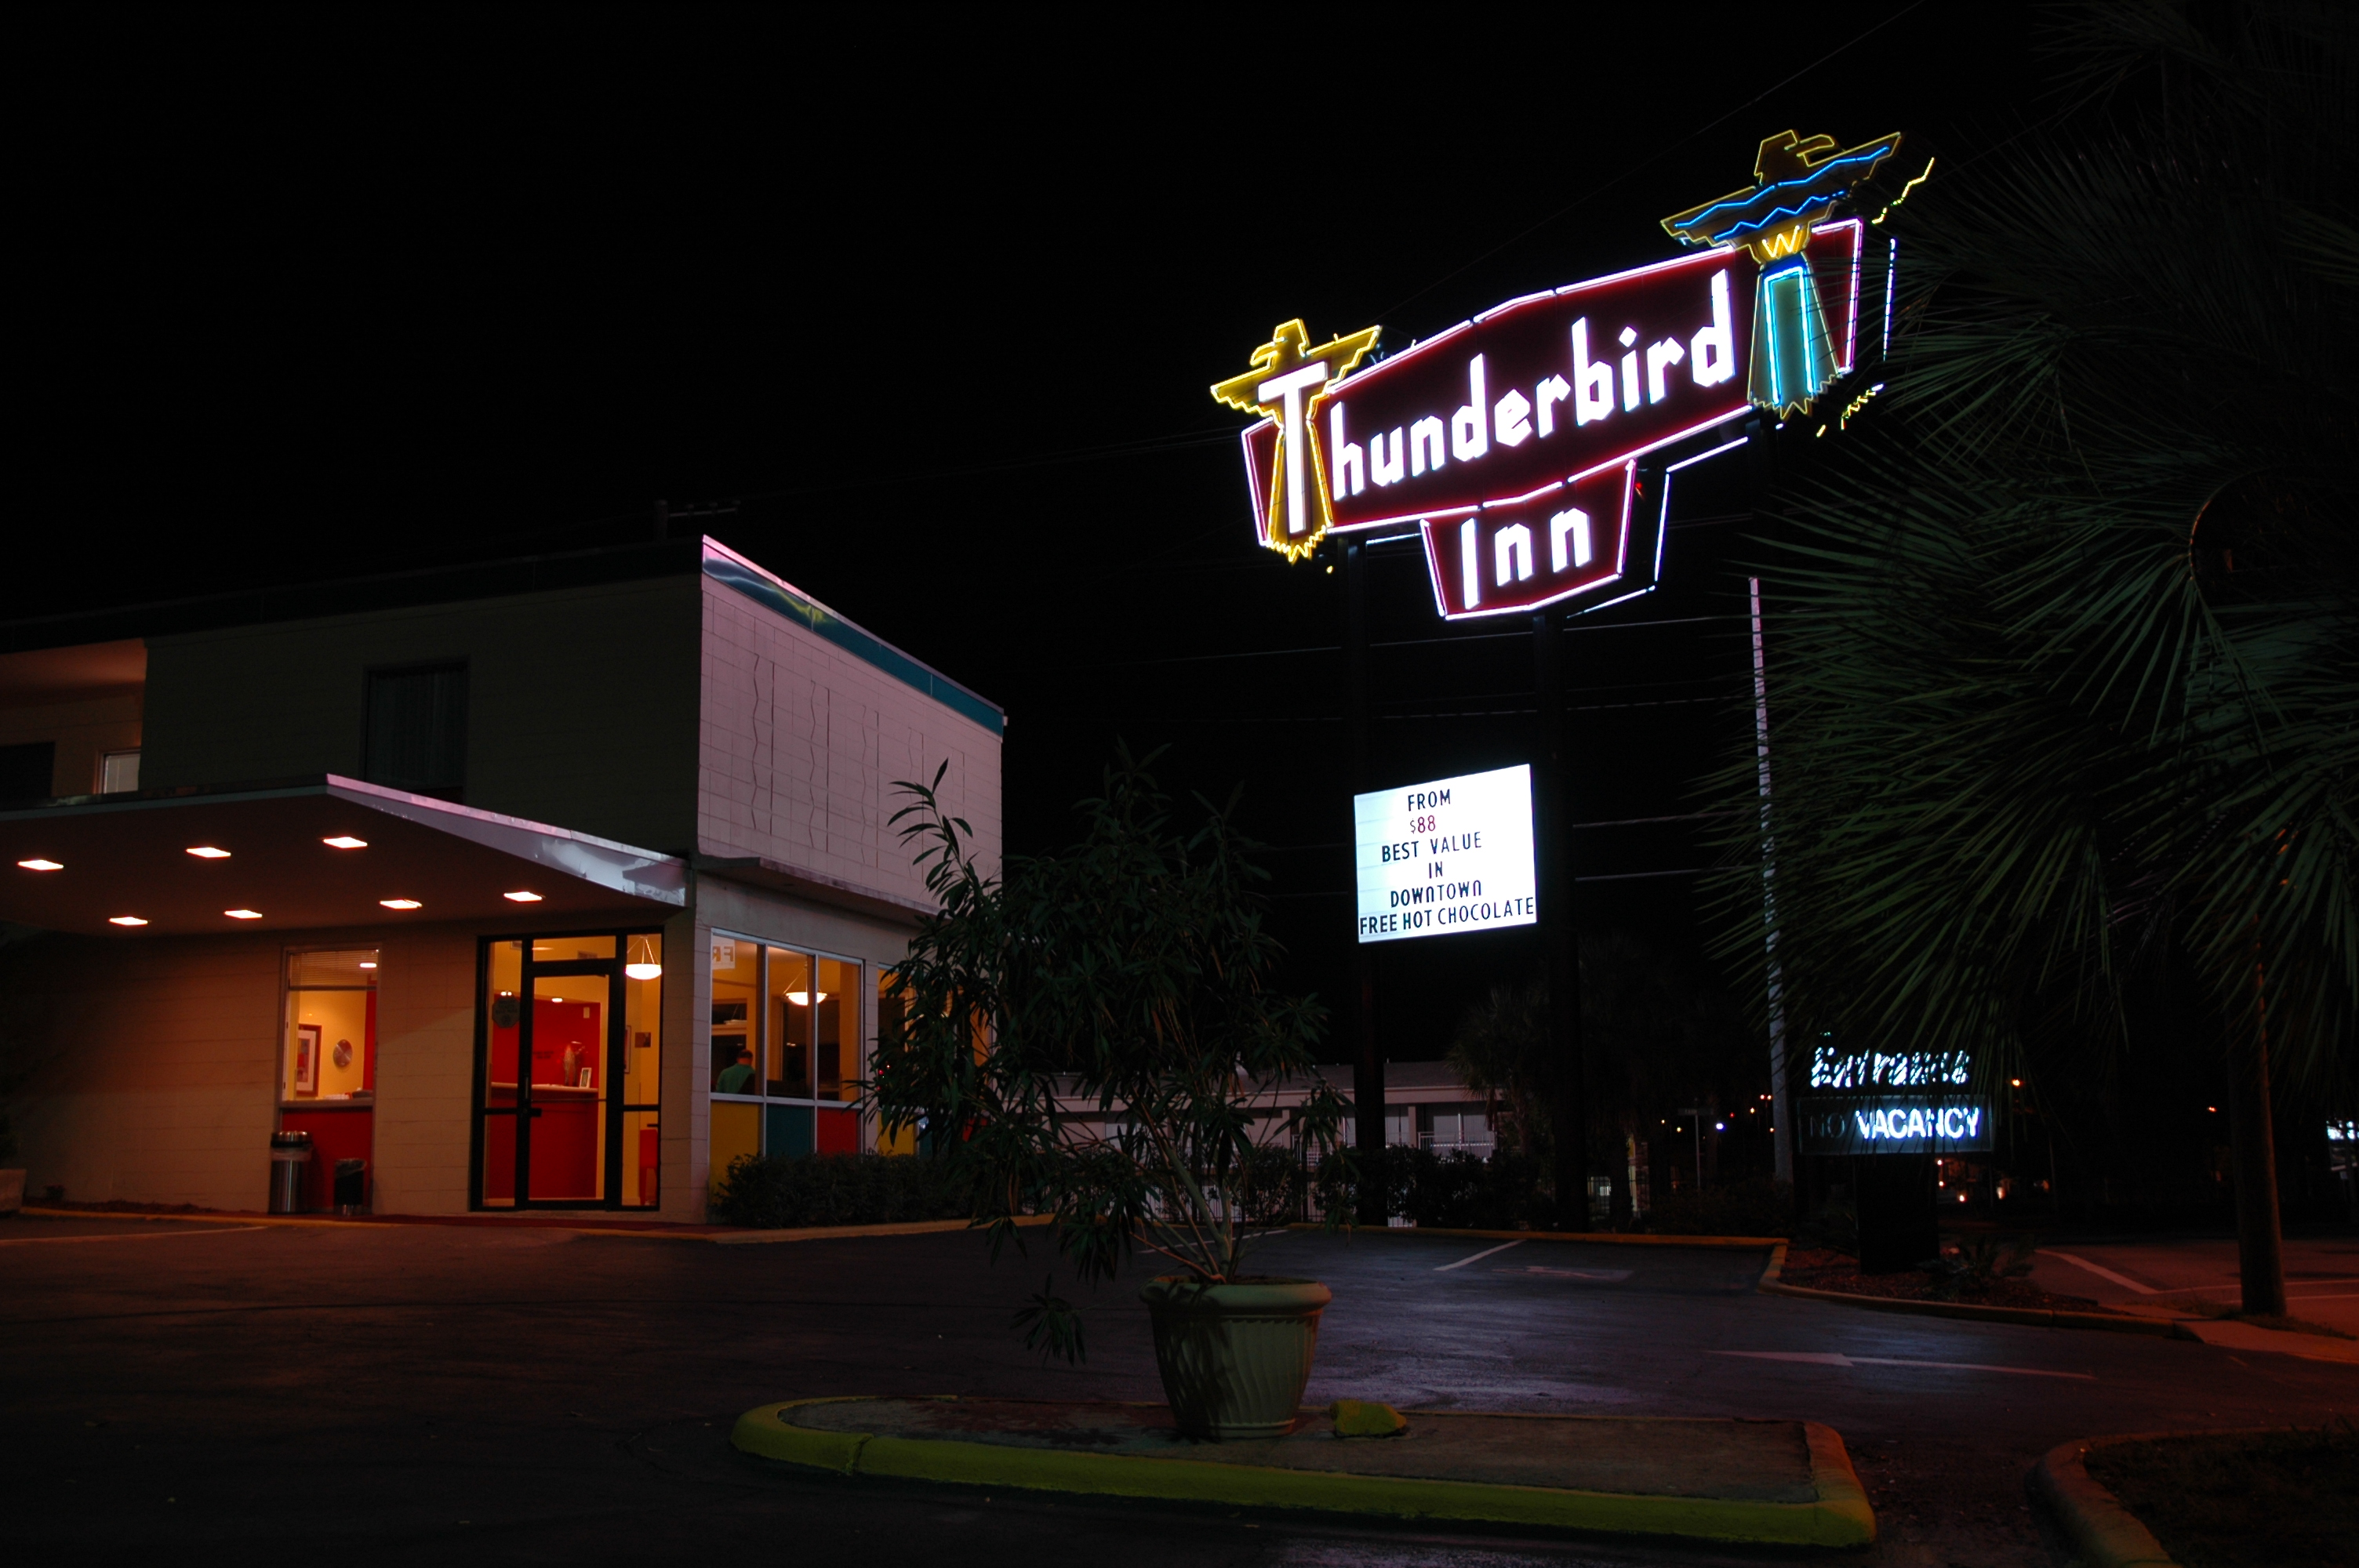 Thunderbird Inn - 611 West Oglethorpe Avenue, Savannah, Georgia U.S.A. - December 5, 2006